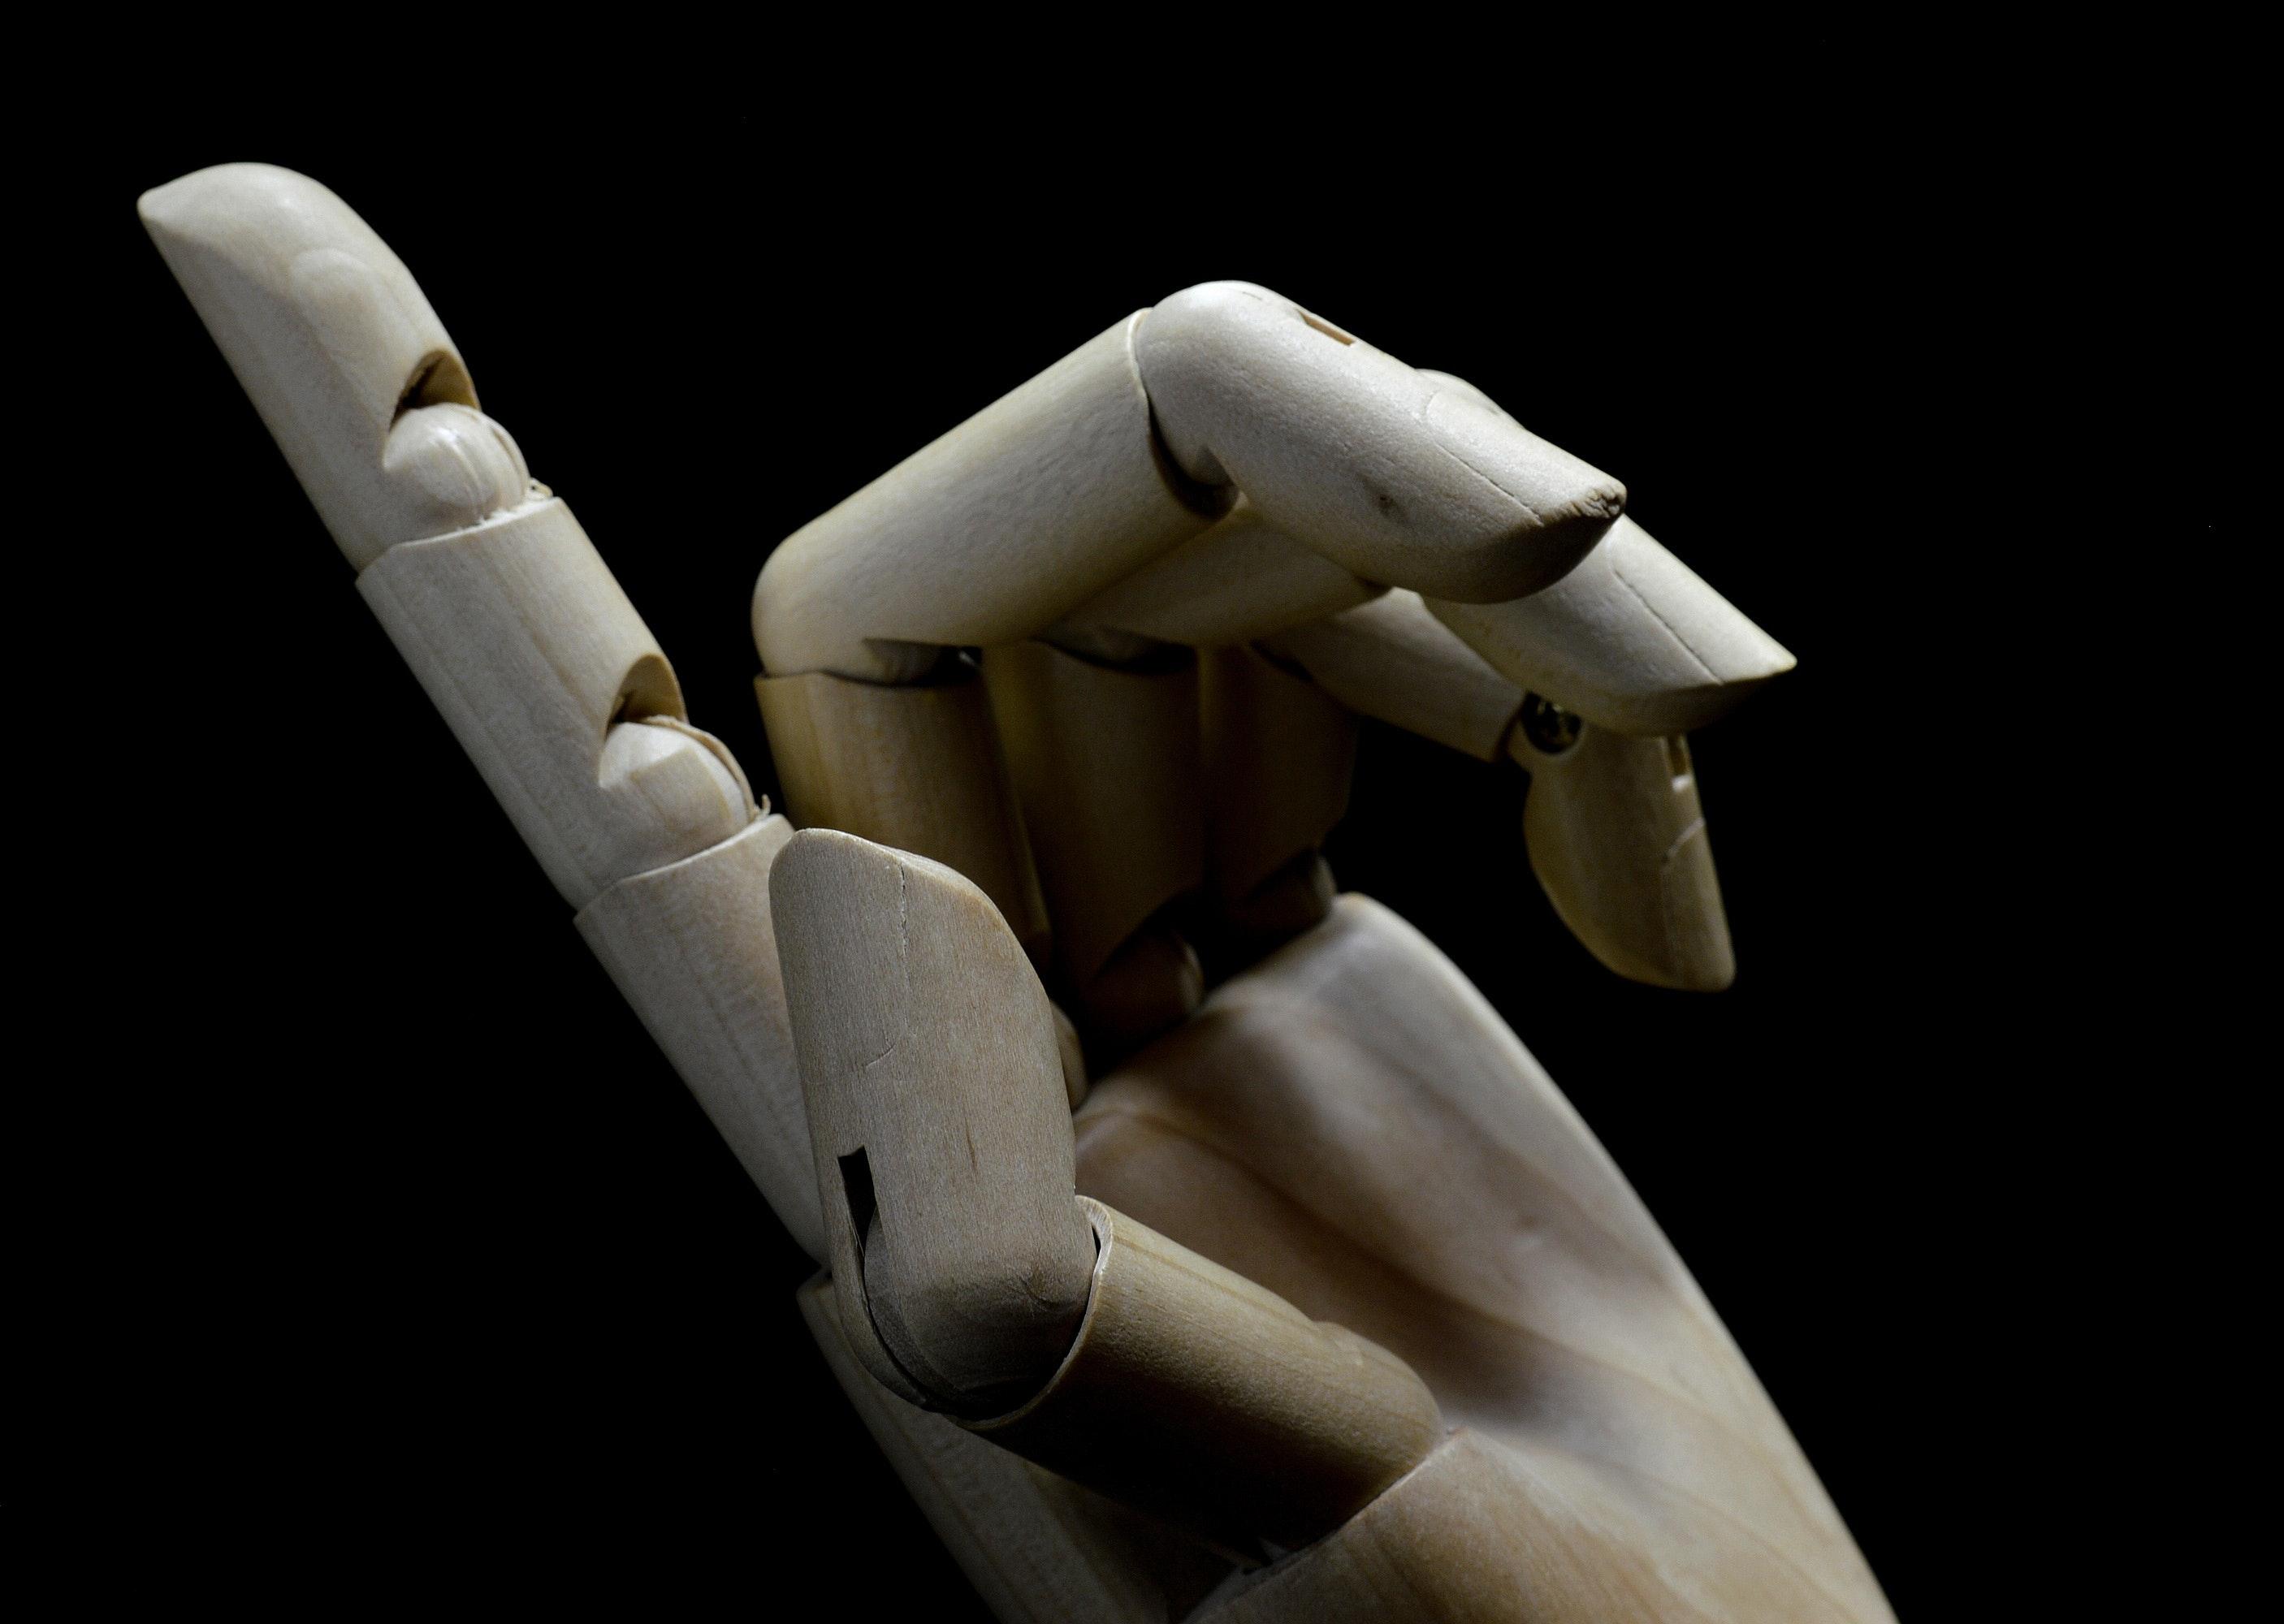 Left Index Finger, Art, Creative, Dark, Doll, HQ Photo